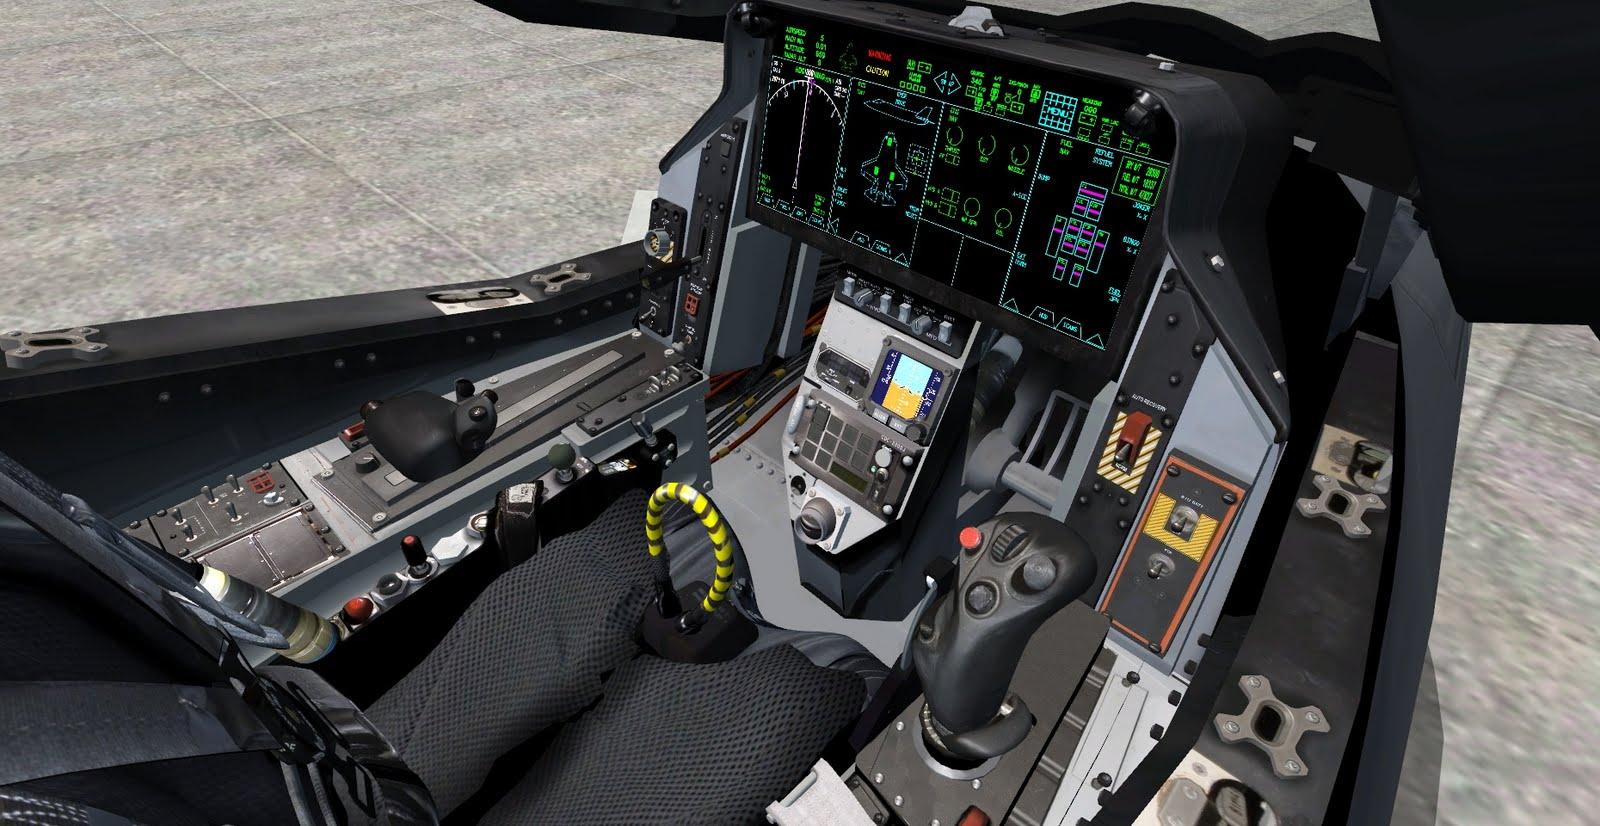 Lockheed Martin F35 Lightning II Stealth Fighter Cockpit Demonstrator HandsOn